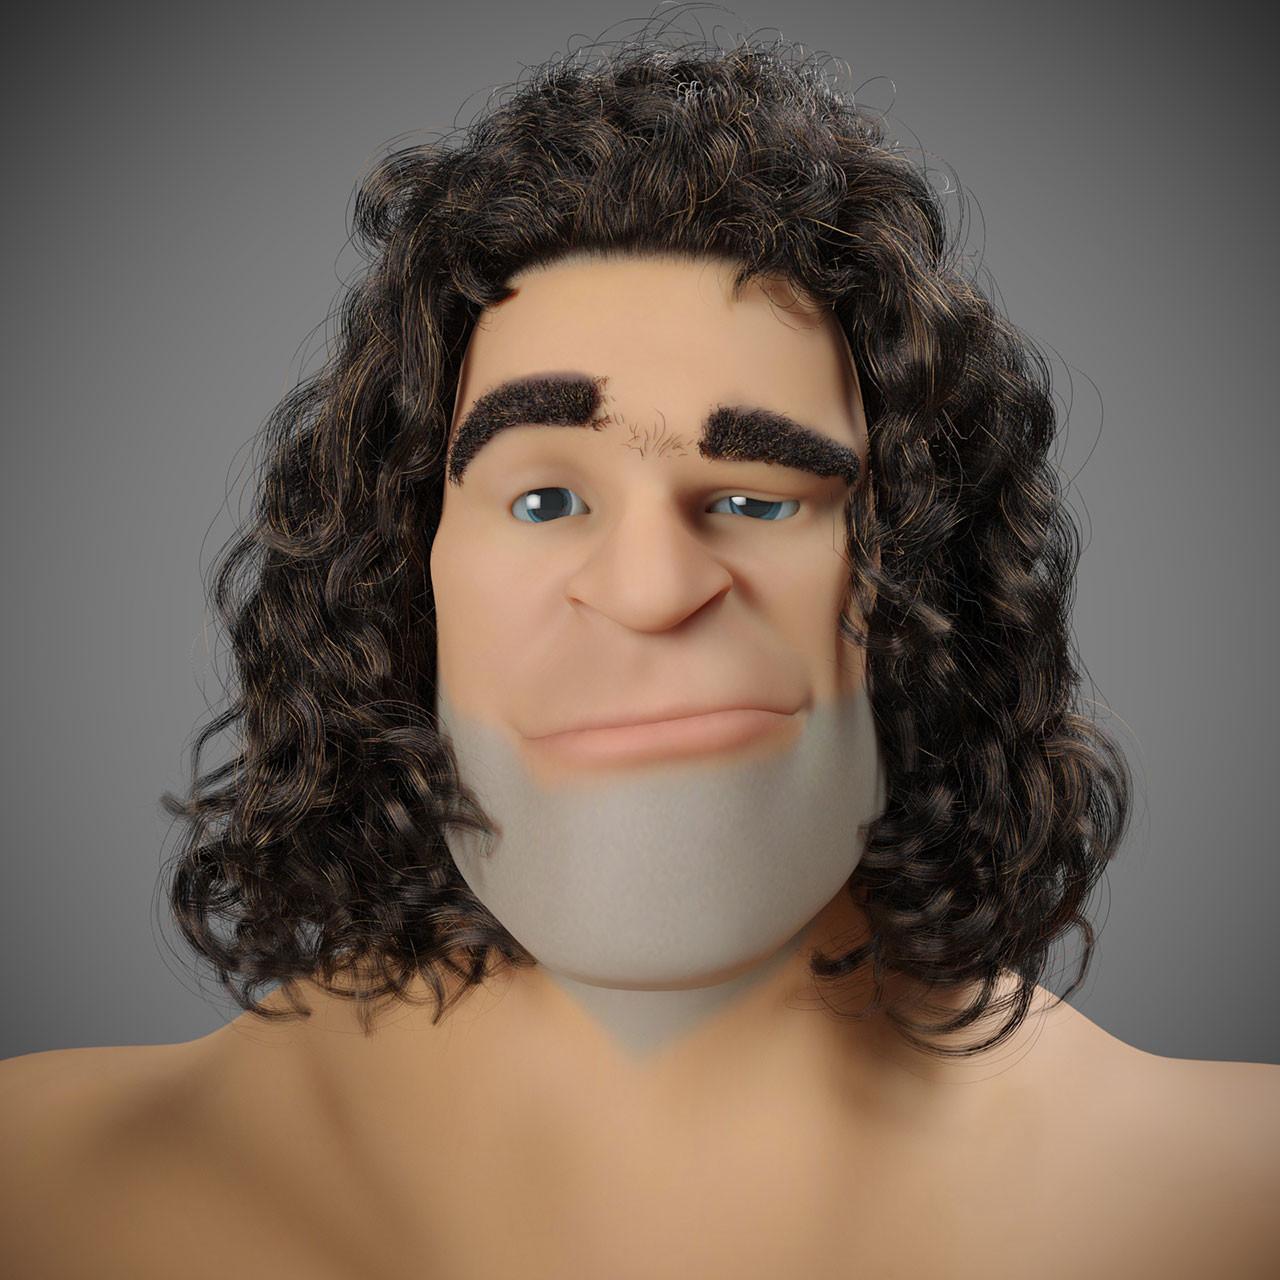 Andrew krivulya joseph hairstyle 1 r 11 by andrew krivulya